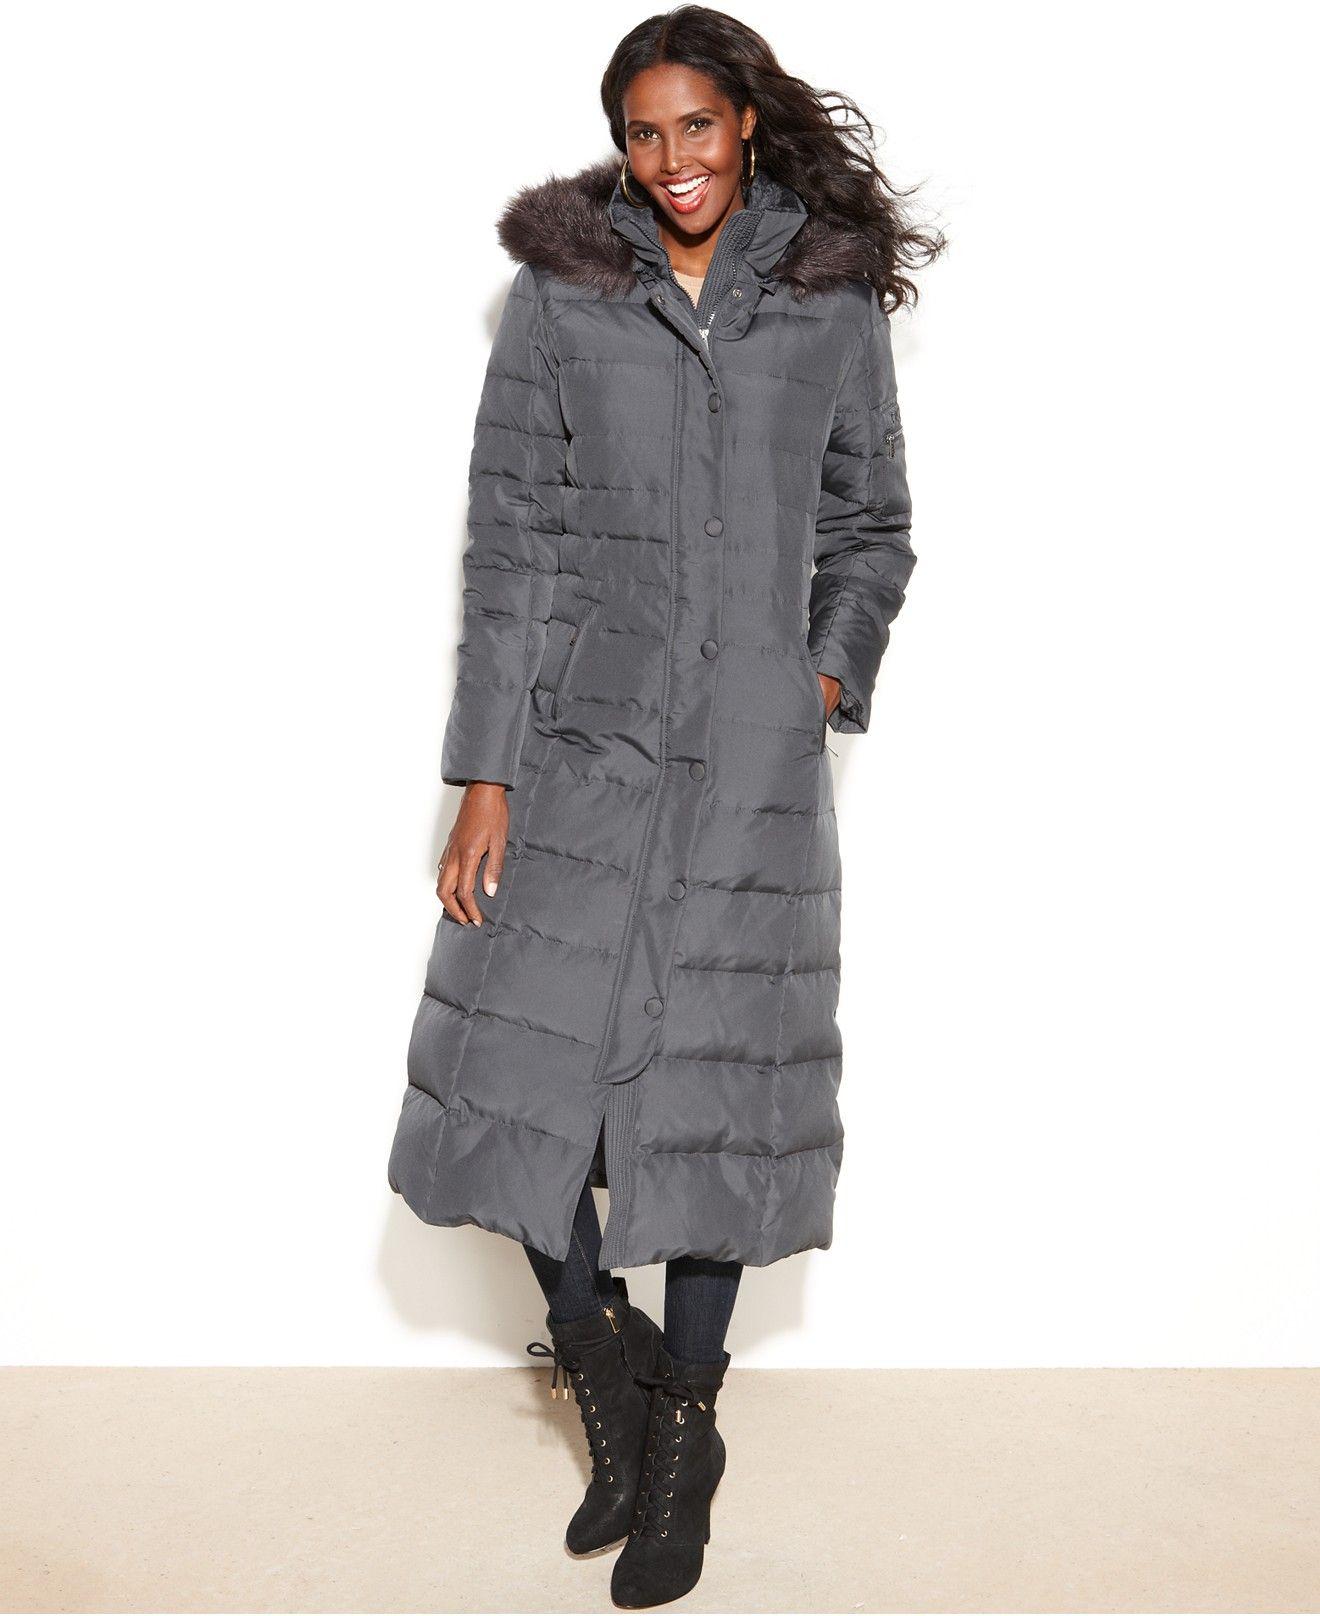 Dkny Faux Fur Trim Hooded Maxi Down Coat Coats Women Macy S Petite Coat Coats For Women Womens Petite Coats [ 1616 x 1320 Pixel ]